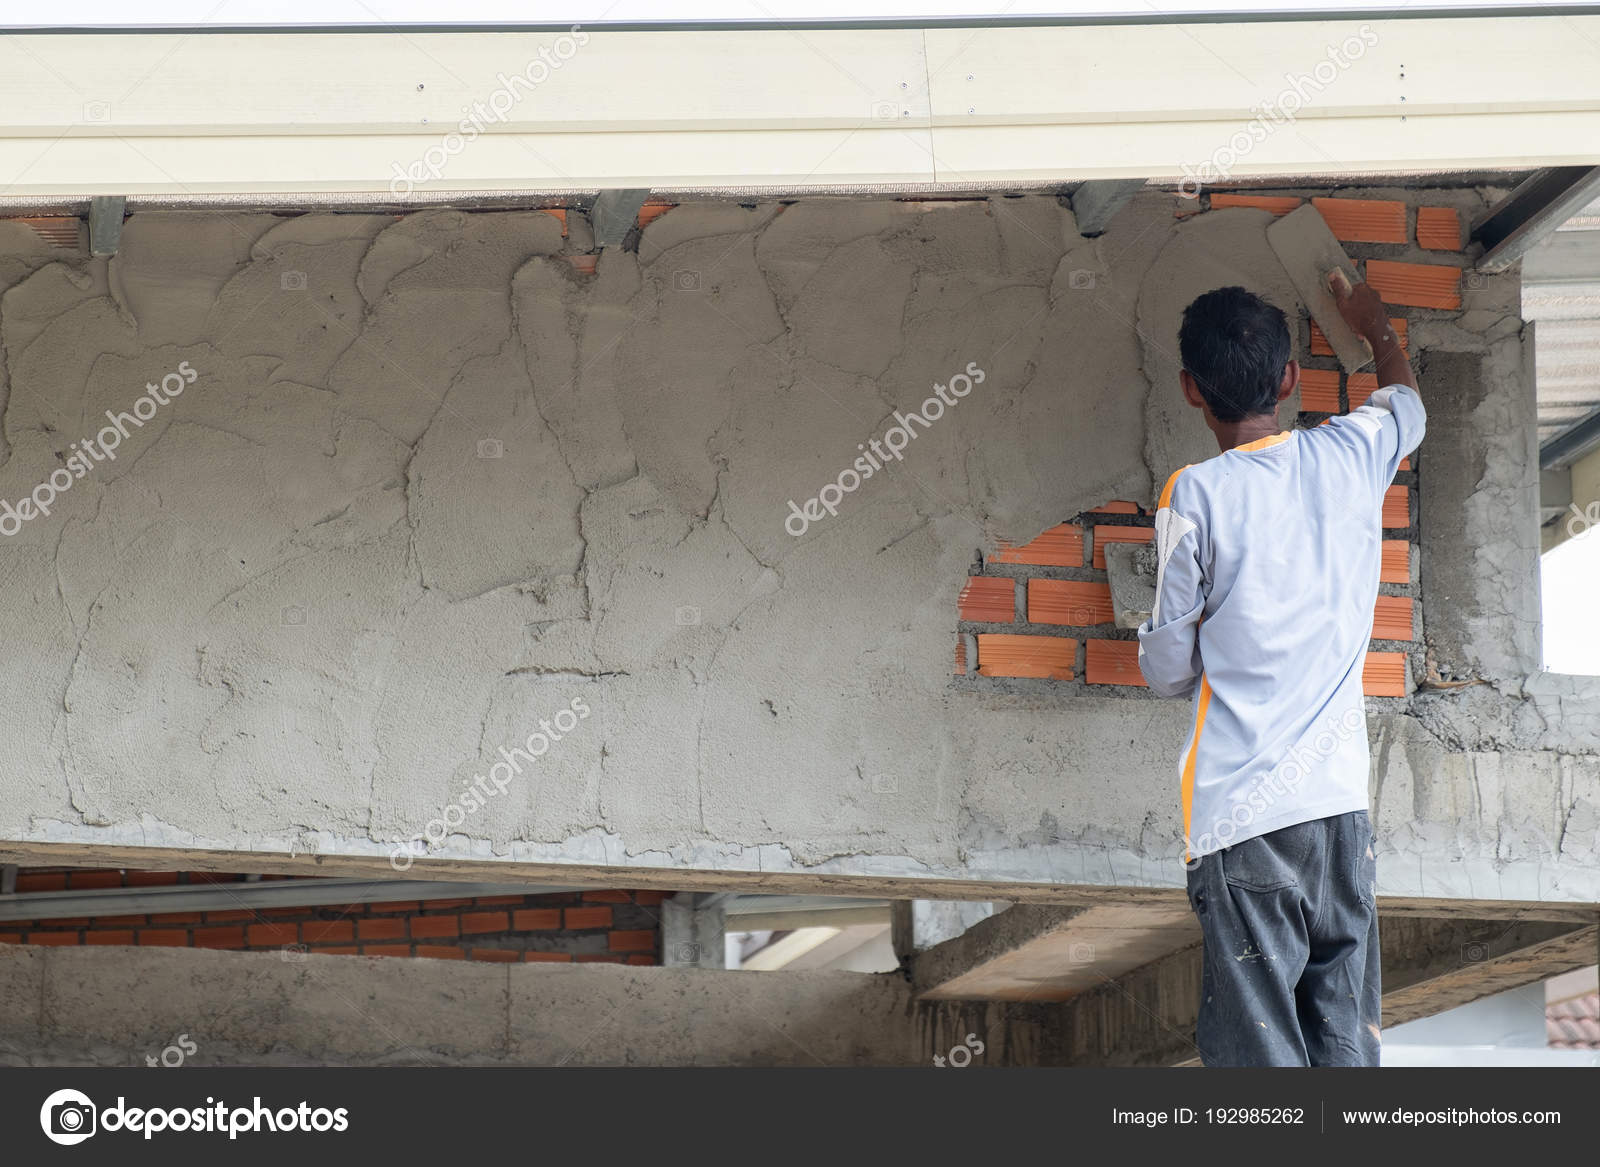 bauherren sind wände verputzen. — stockfoto © yortzafoto #192985262